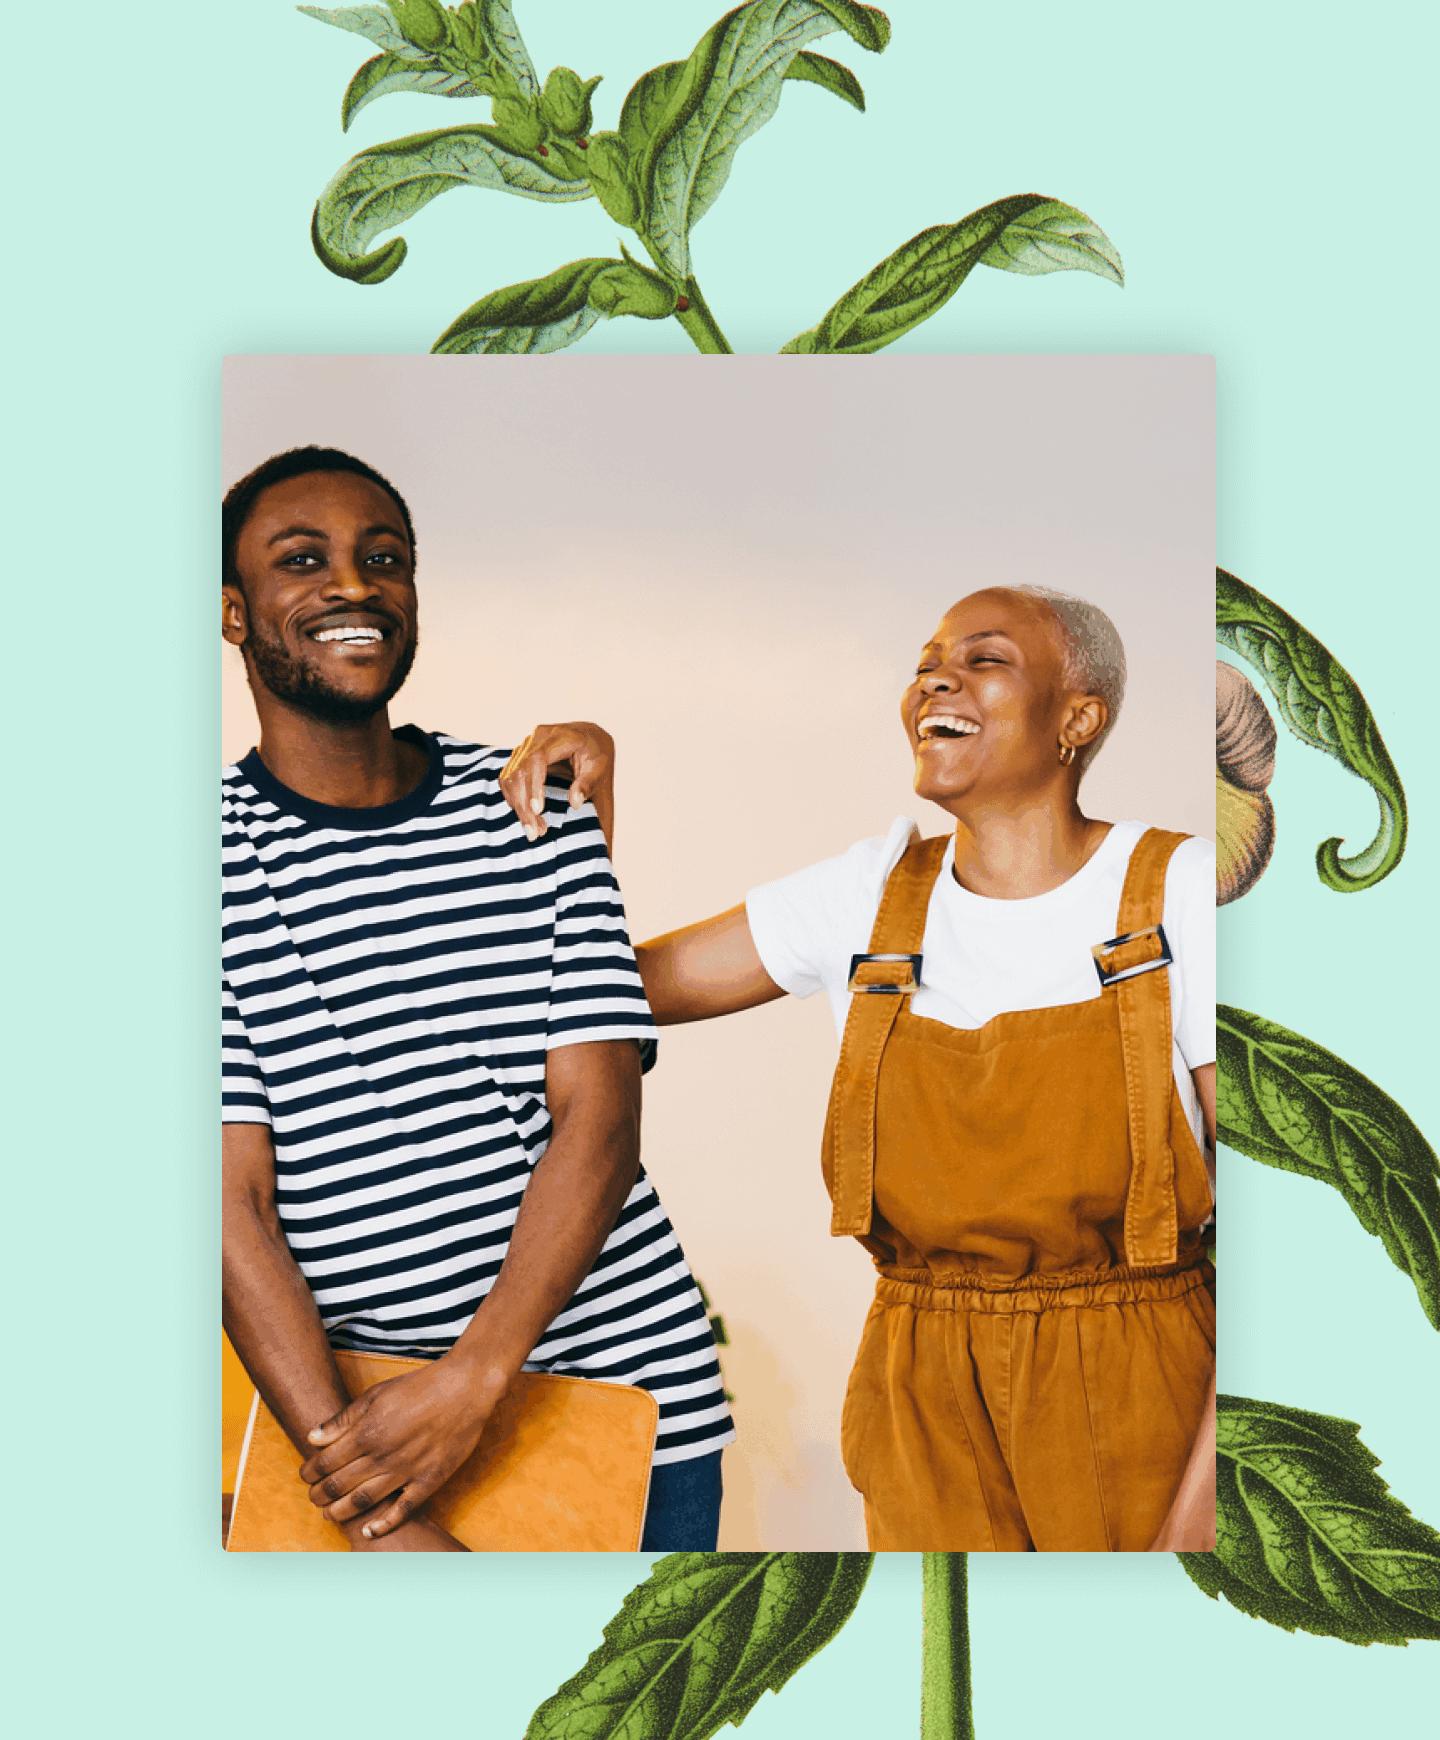 Botanical illustration behind black man and woman hand on his shoulder